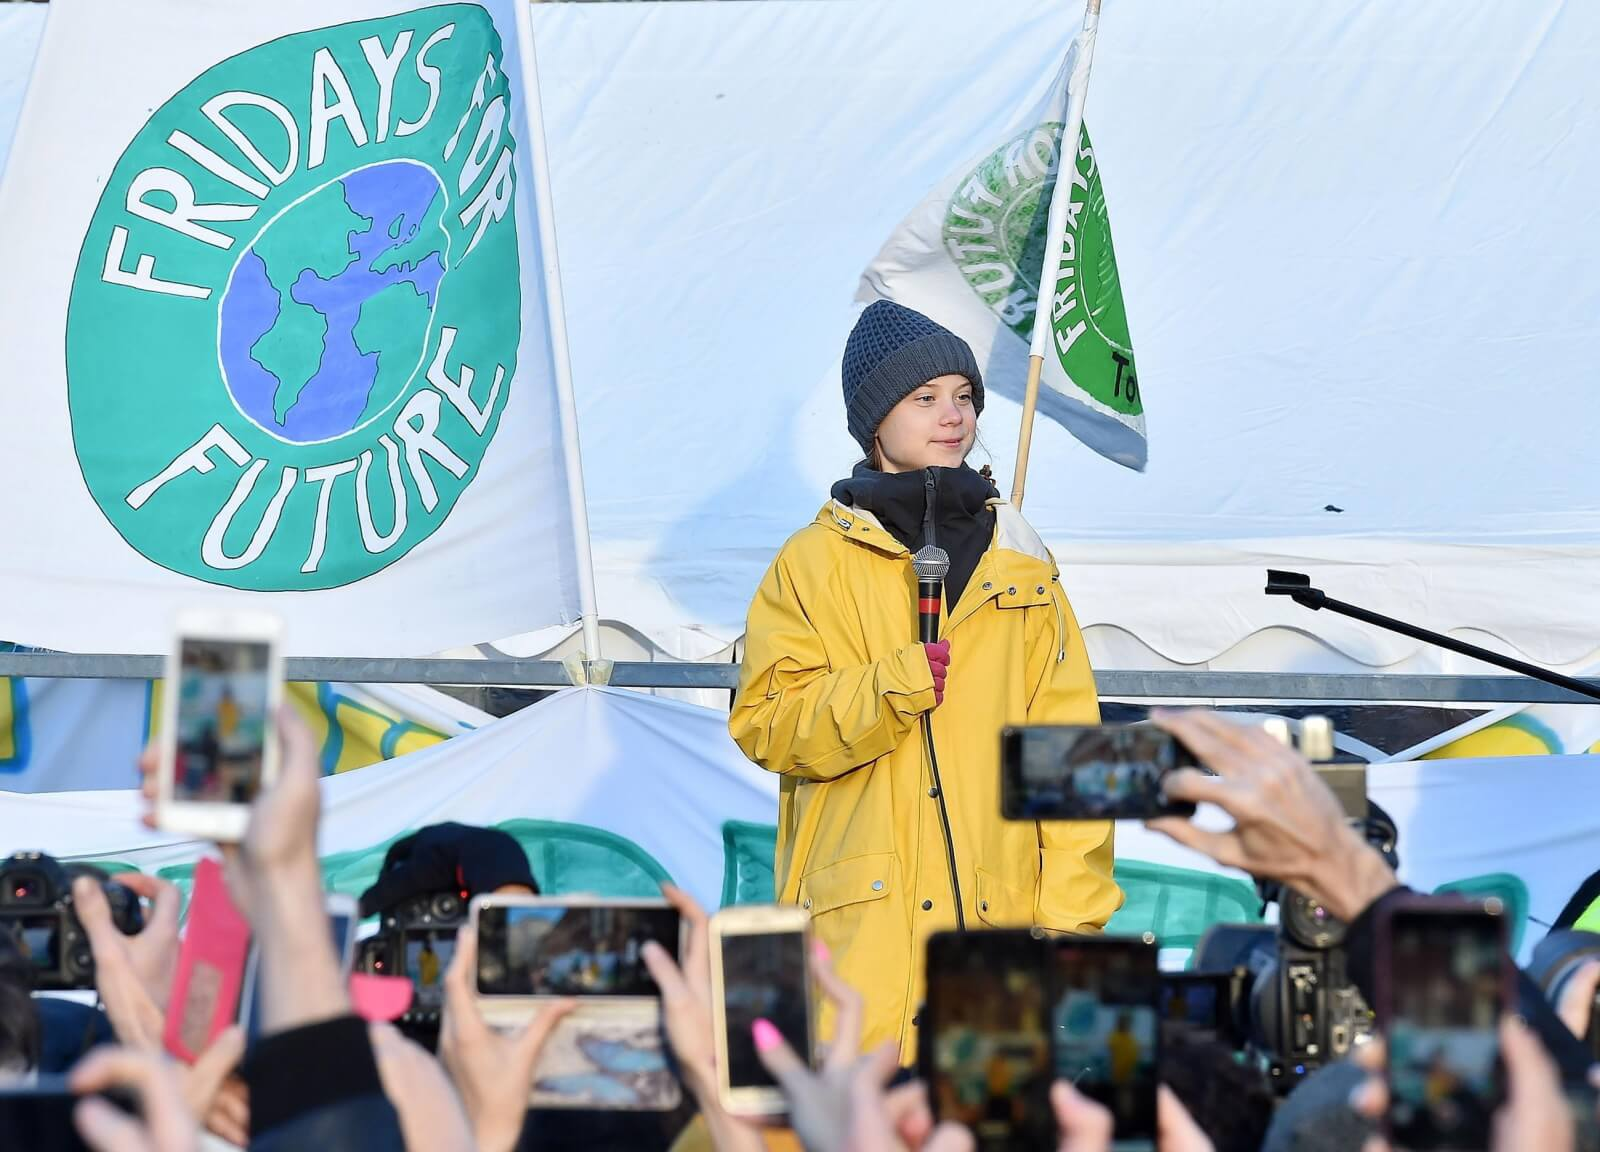 Greta Thunberg na spotkaniu w Turynie fot. EPA/ALESSANDRO DI MARCO